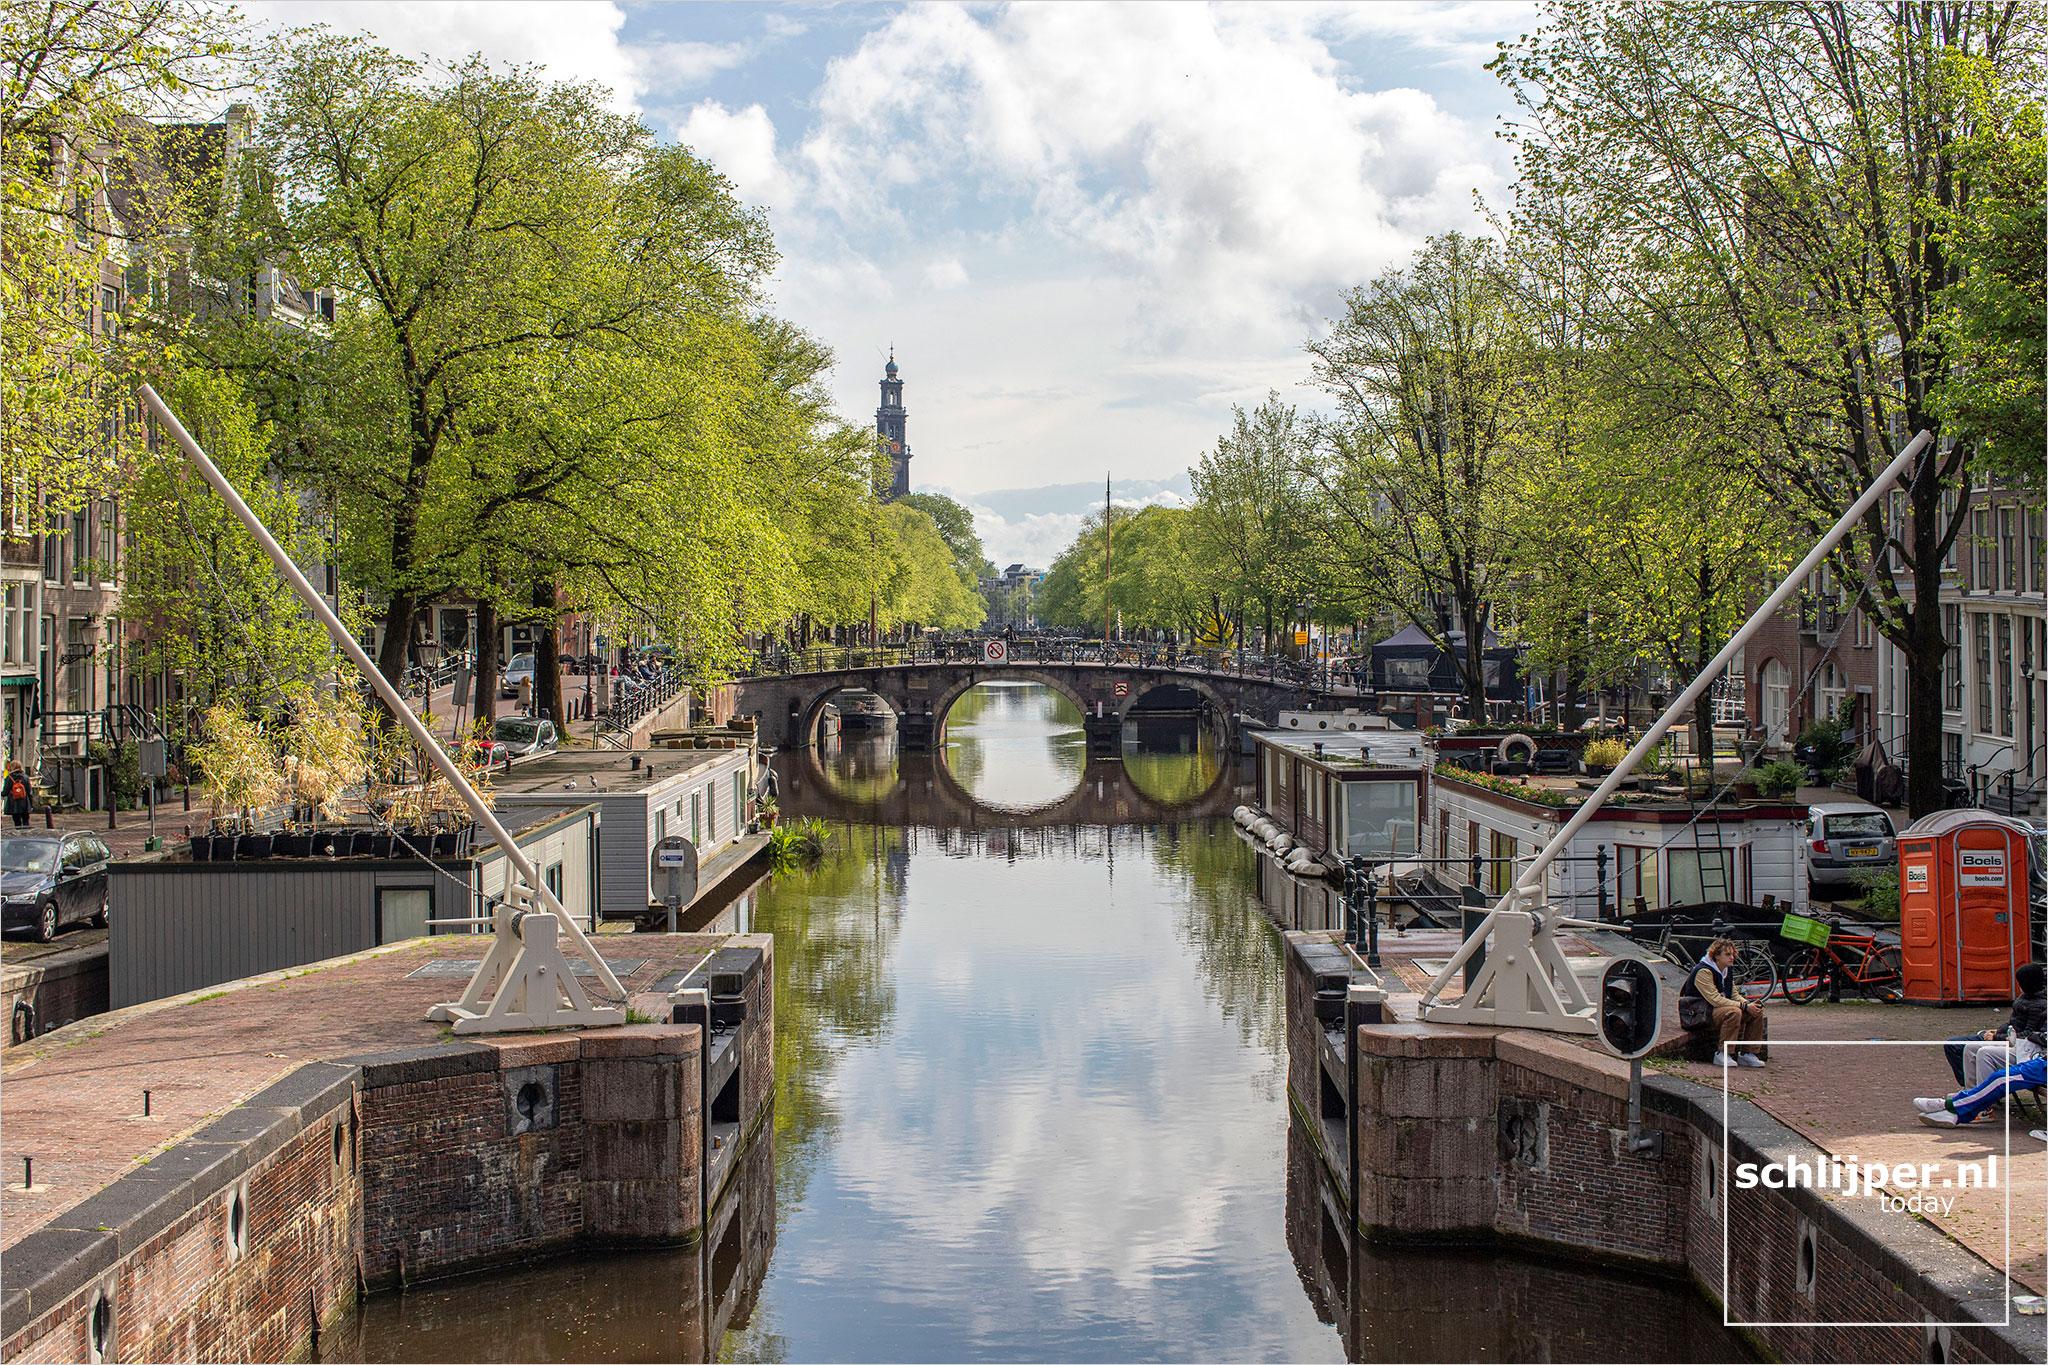 The Netherlands, Amsterdam, 24 mei 2021